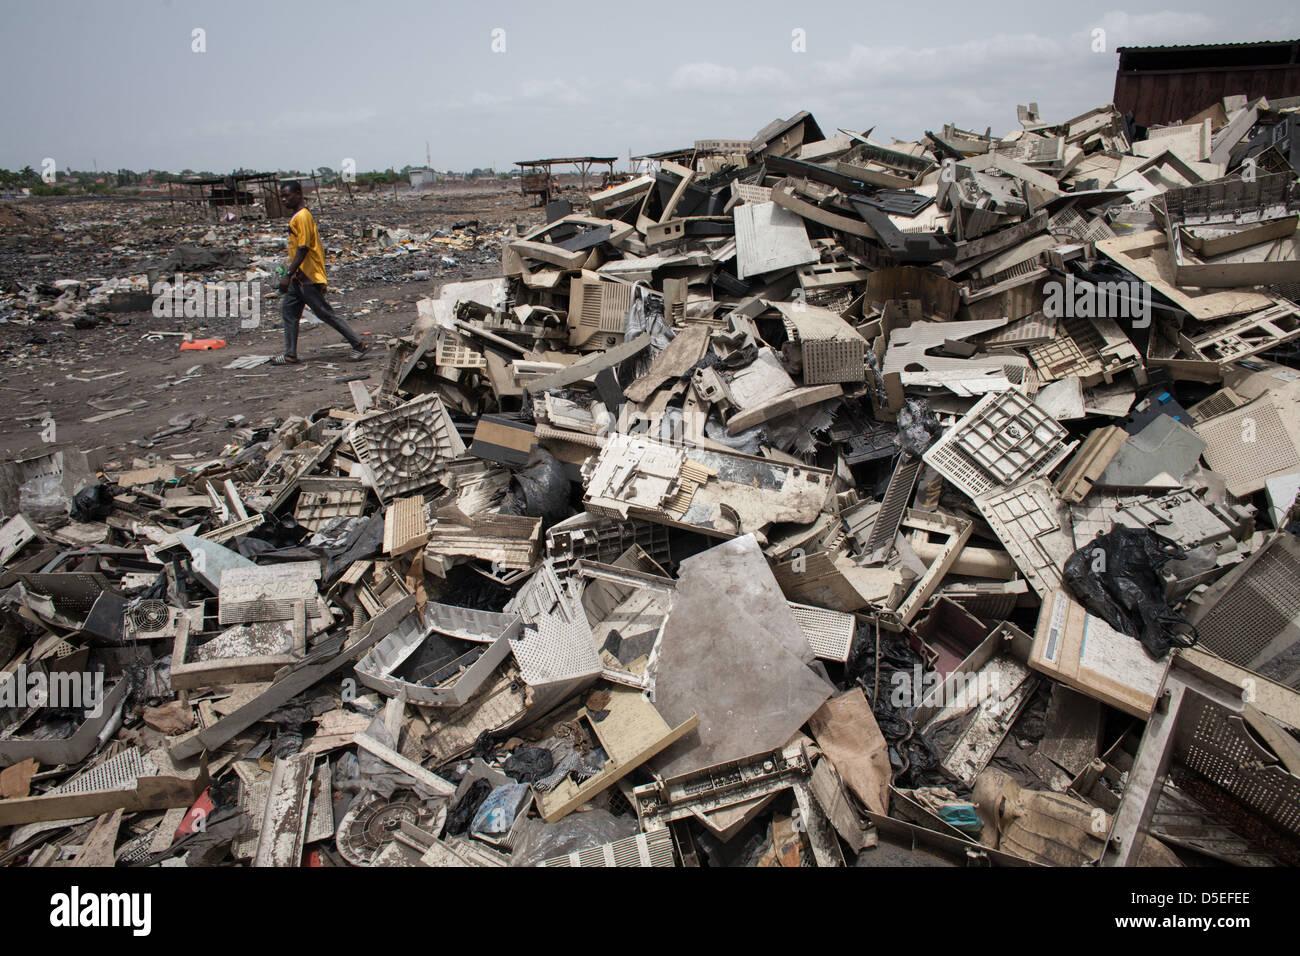 Rifiuti elettronici in discarica Agbogbloshie, Accra, Ghana. Immagini Stock